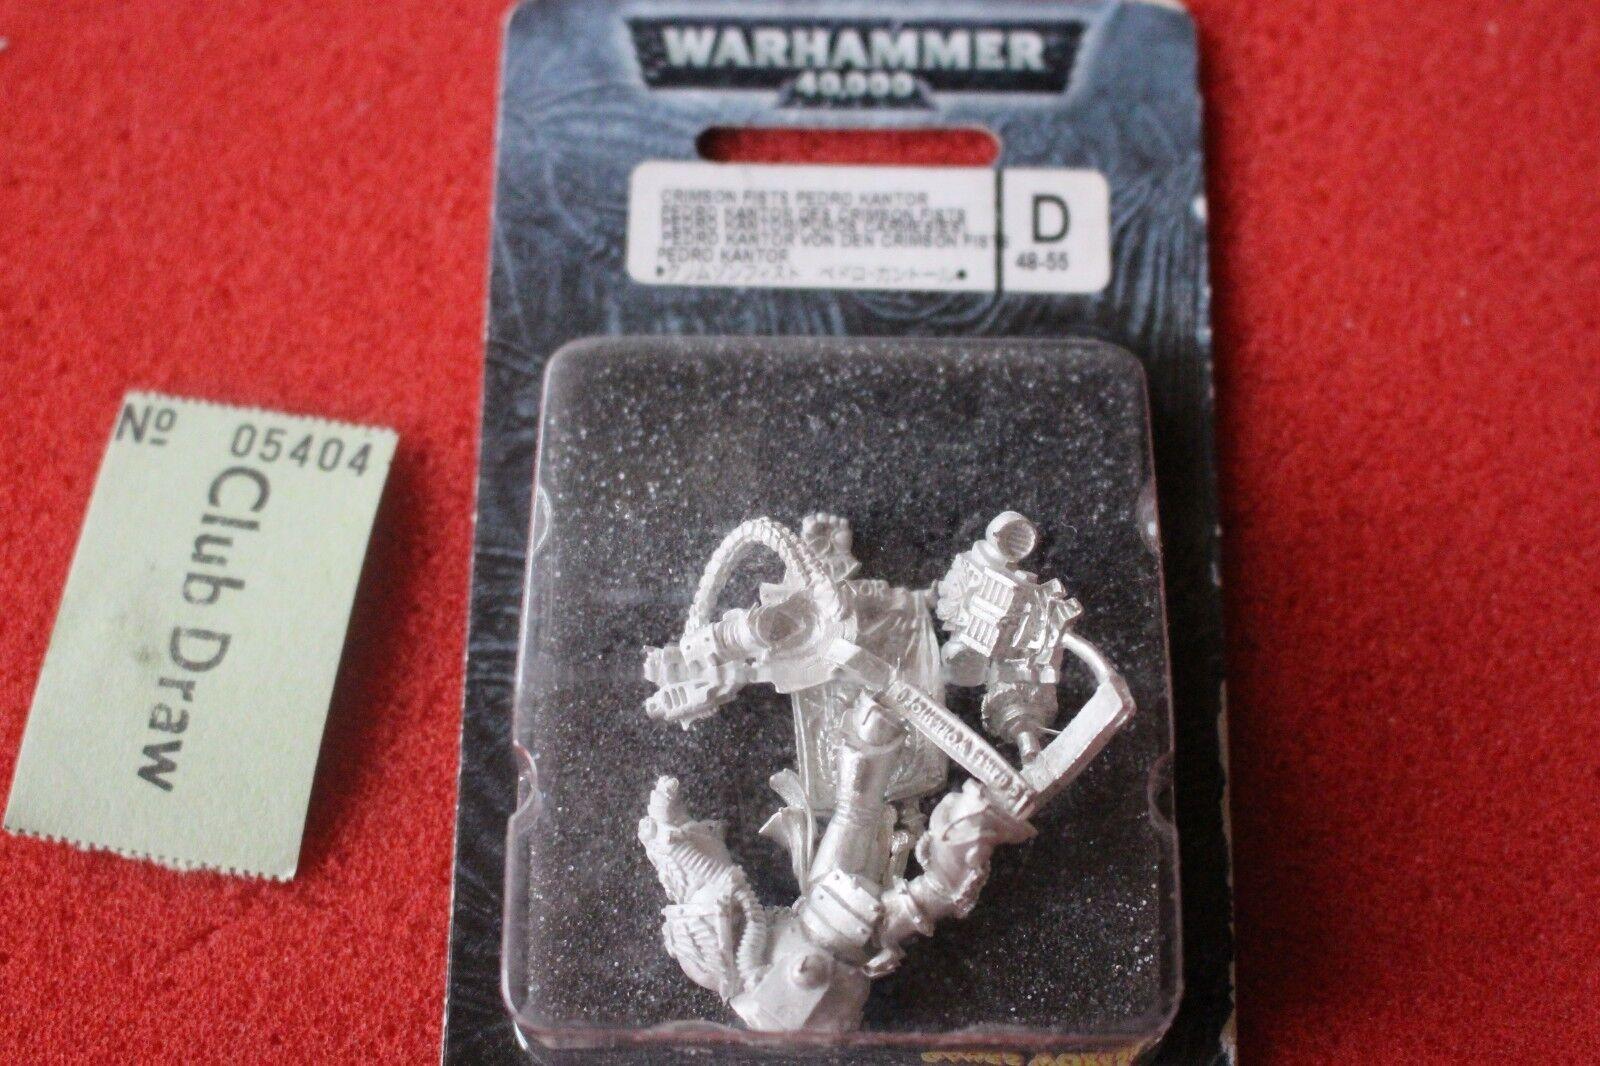 Games Workshop Warhammer 40k Crimson Fists Pedro Kantor BNIB Metal GW New Sealed